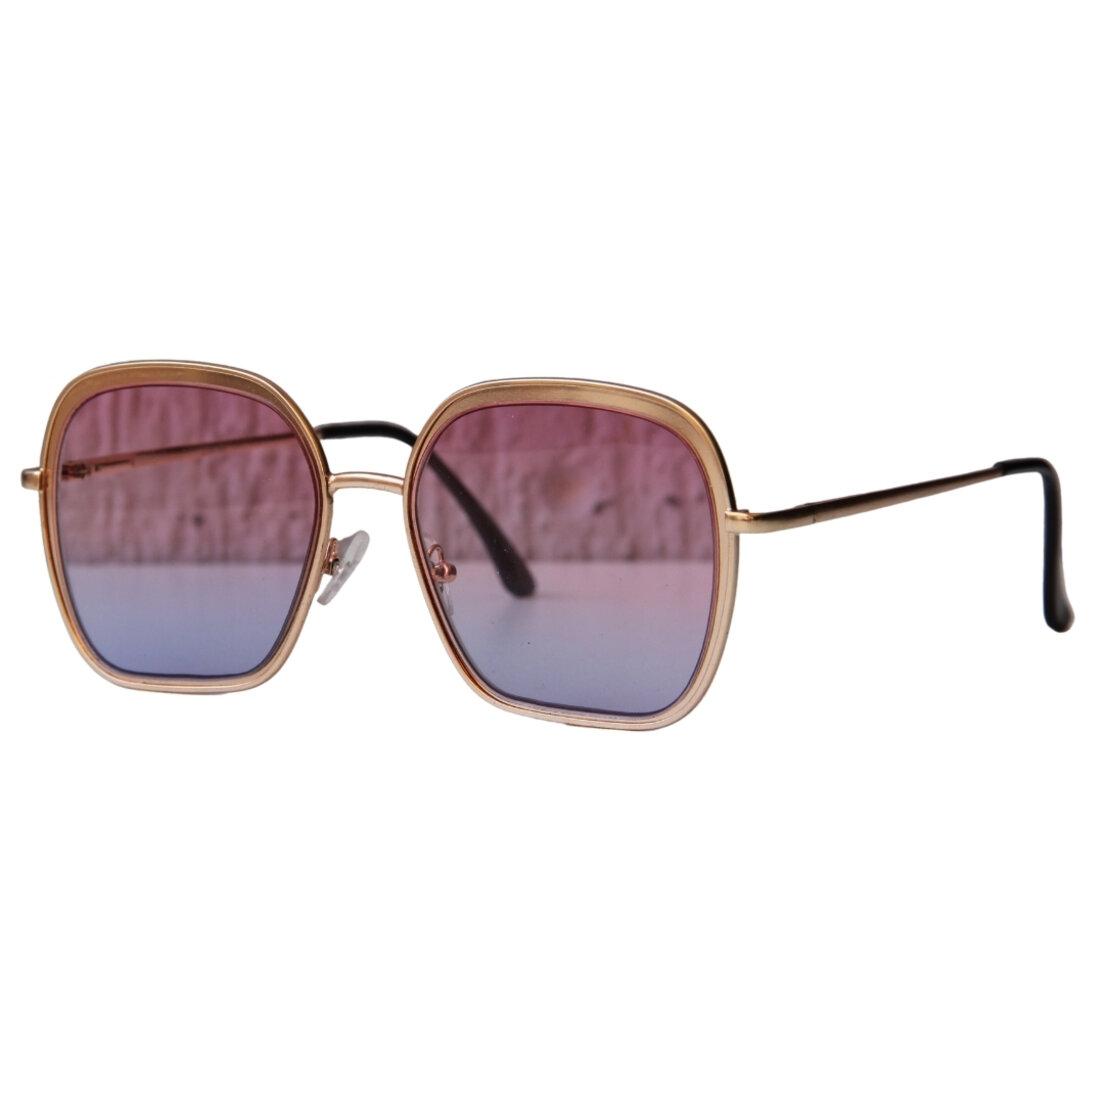 OUTLET - Óculos de Sol Khatto Square - Colorido